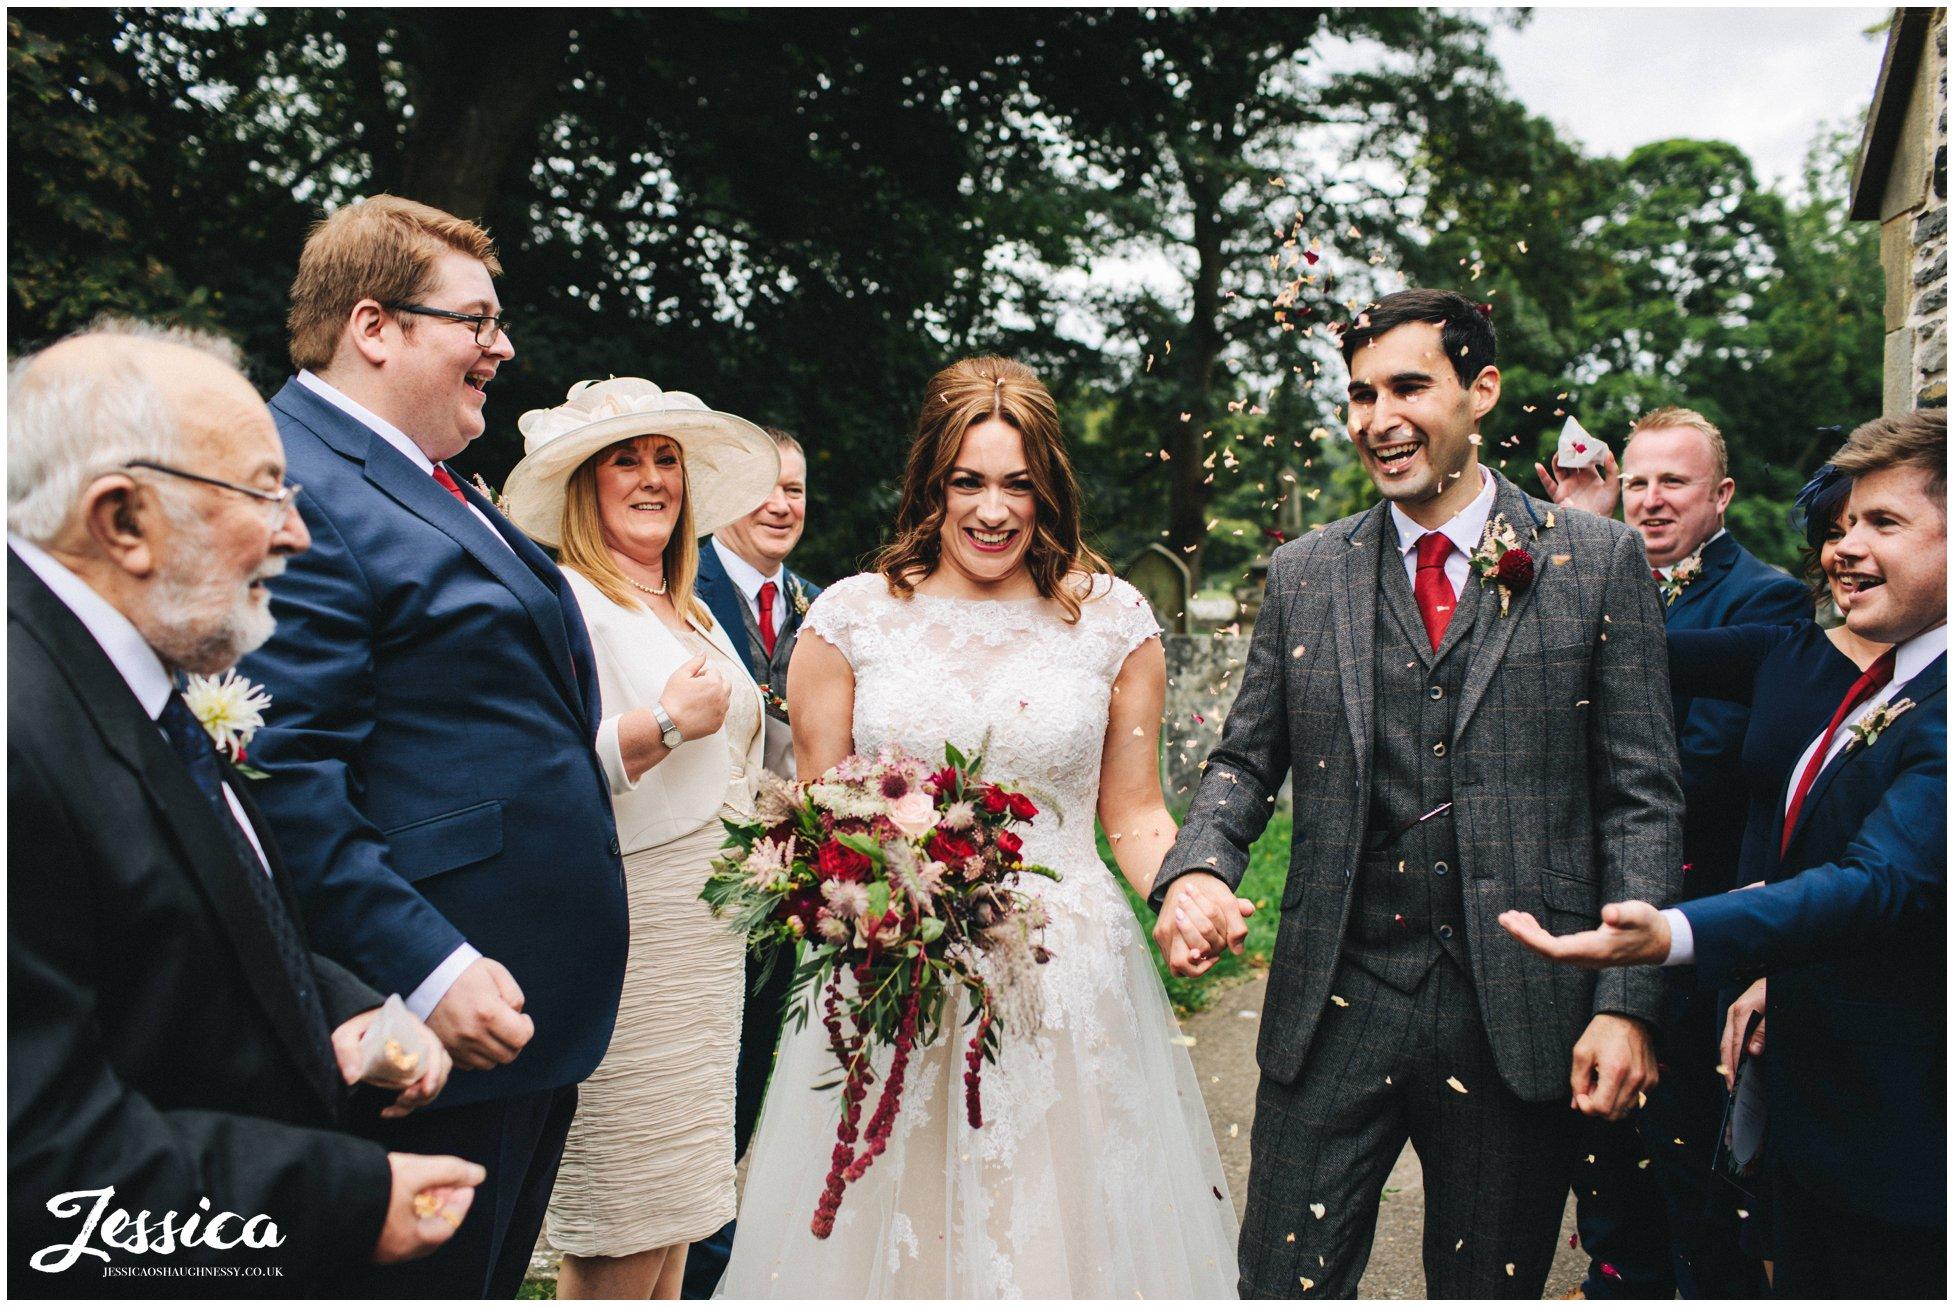 the bride and groom walk through their confetti line